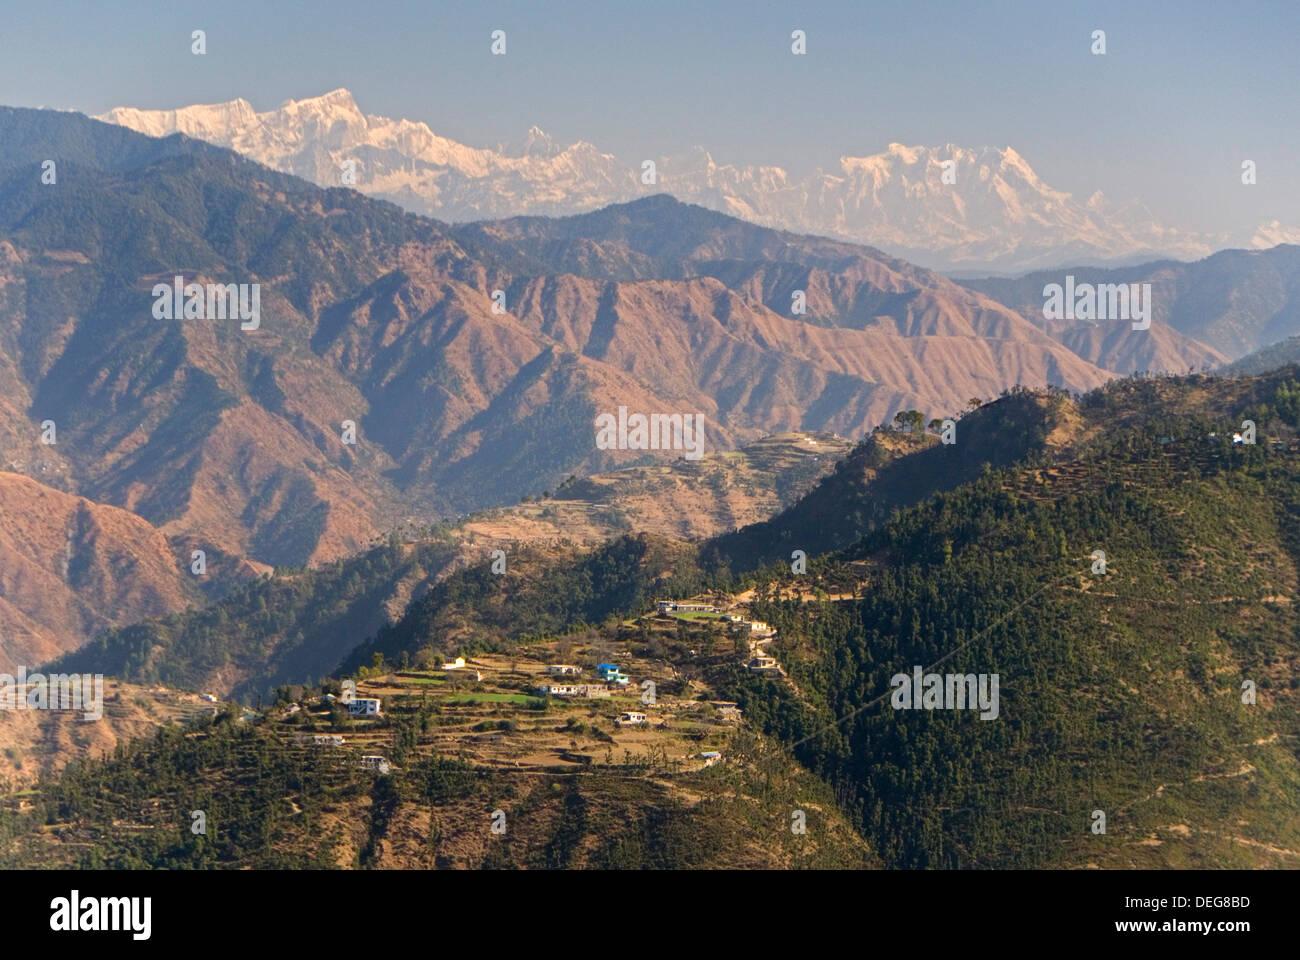 Montagnes, Gangotri Garwhal Himal, vu de Mussoorie hill station, Uttarakhand, Inde, Asie Photo Stock